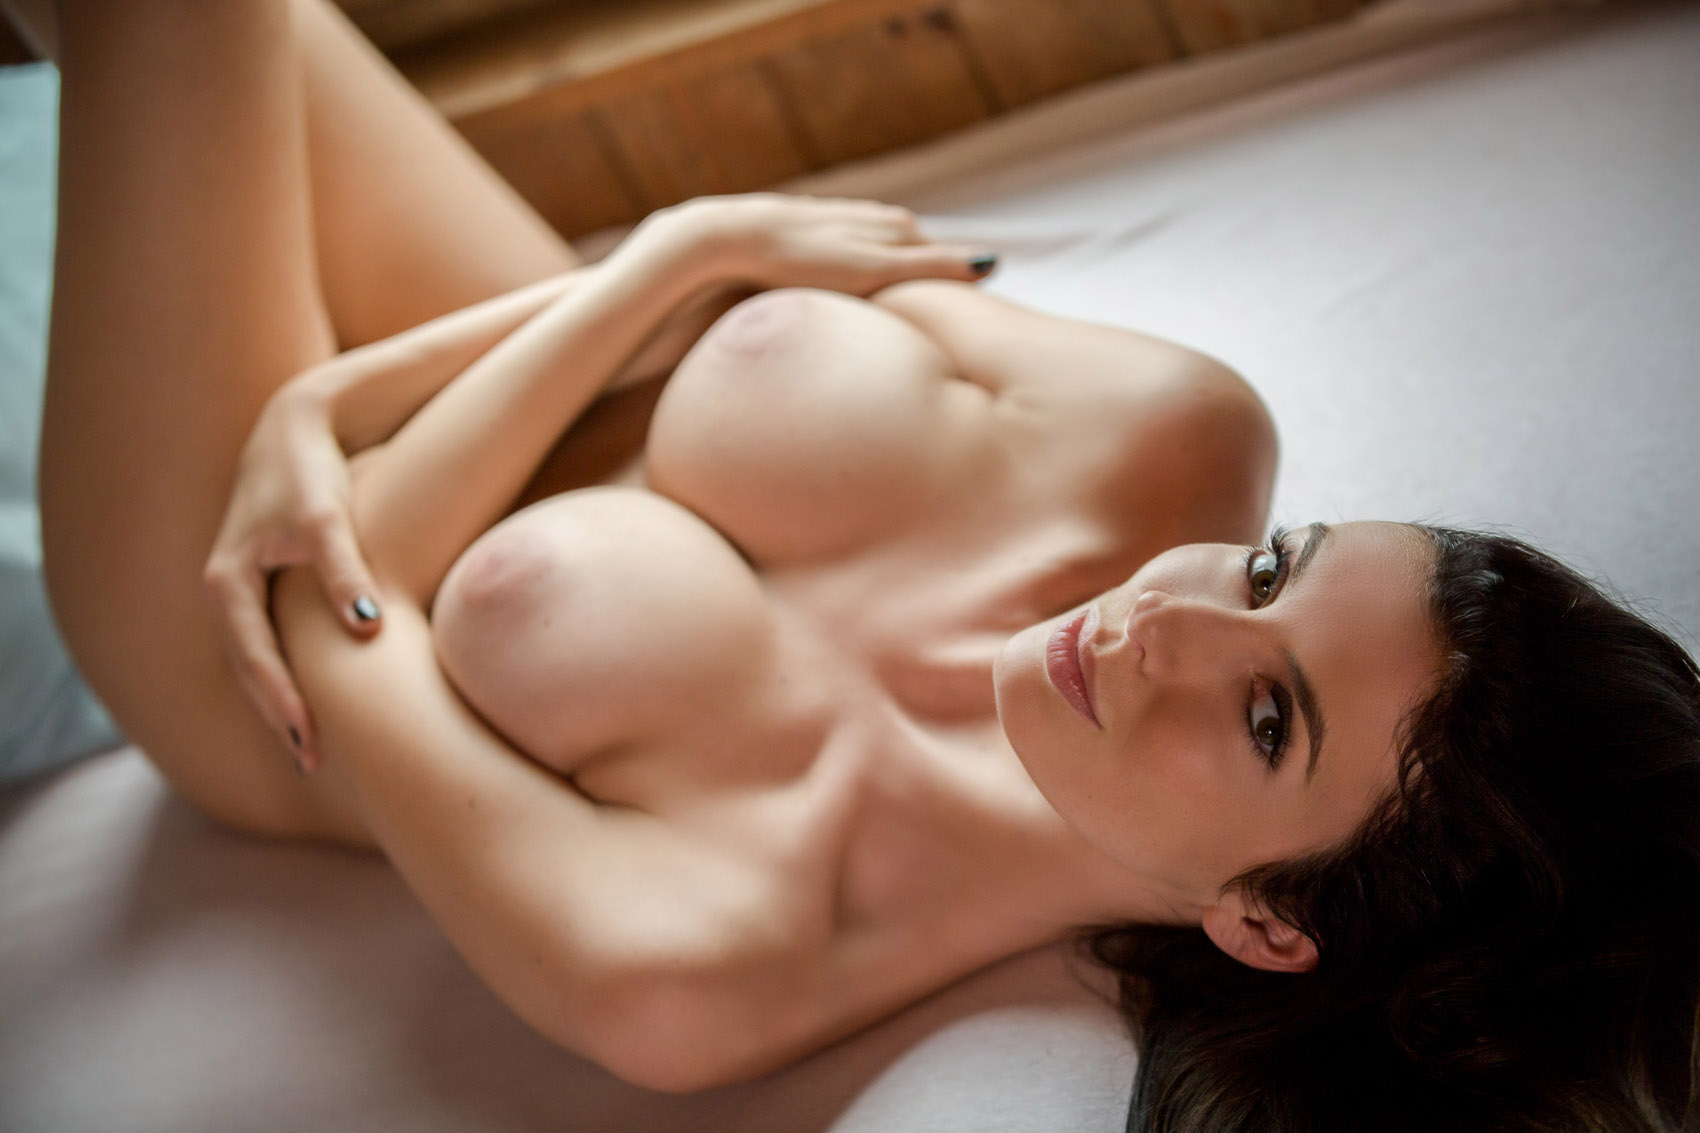 Playboy sexy nipples #7